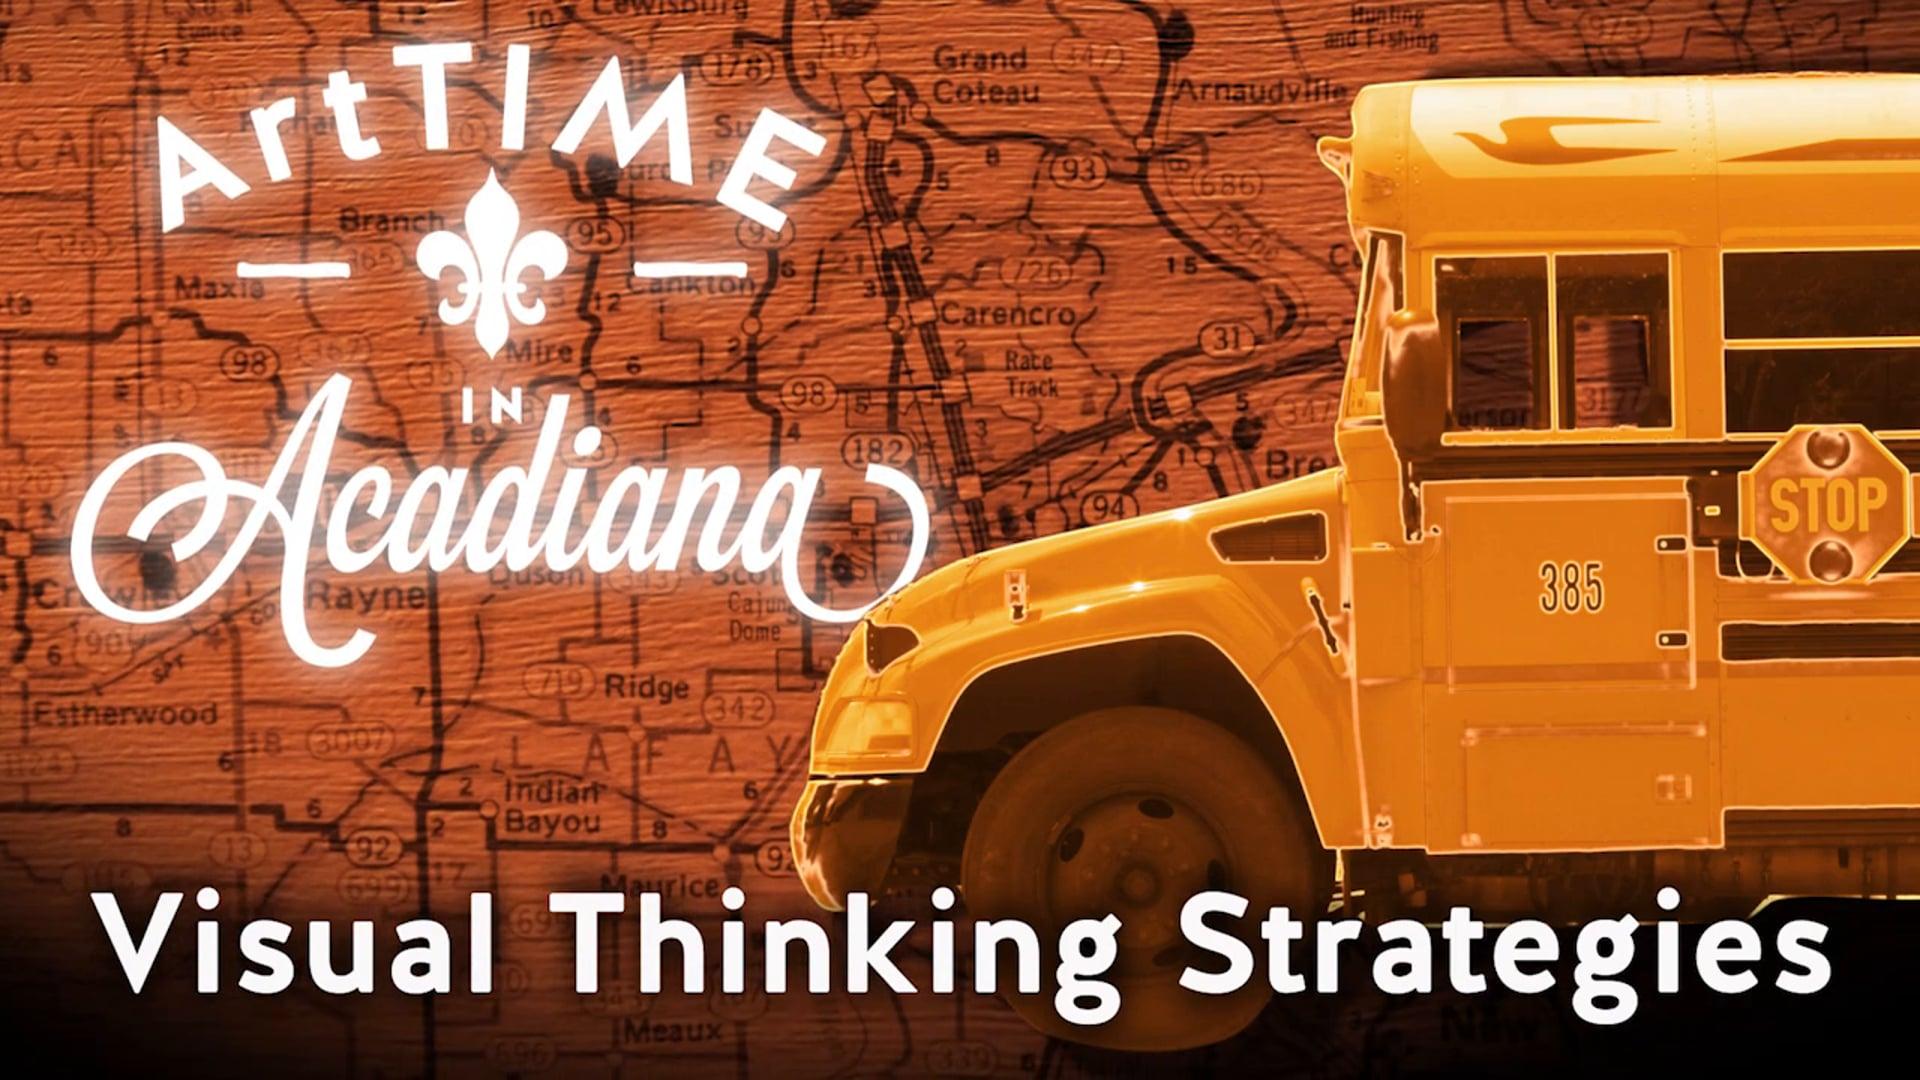 ArtTIME in Acadiana: Visual Thinking Strategies